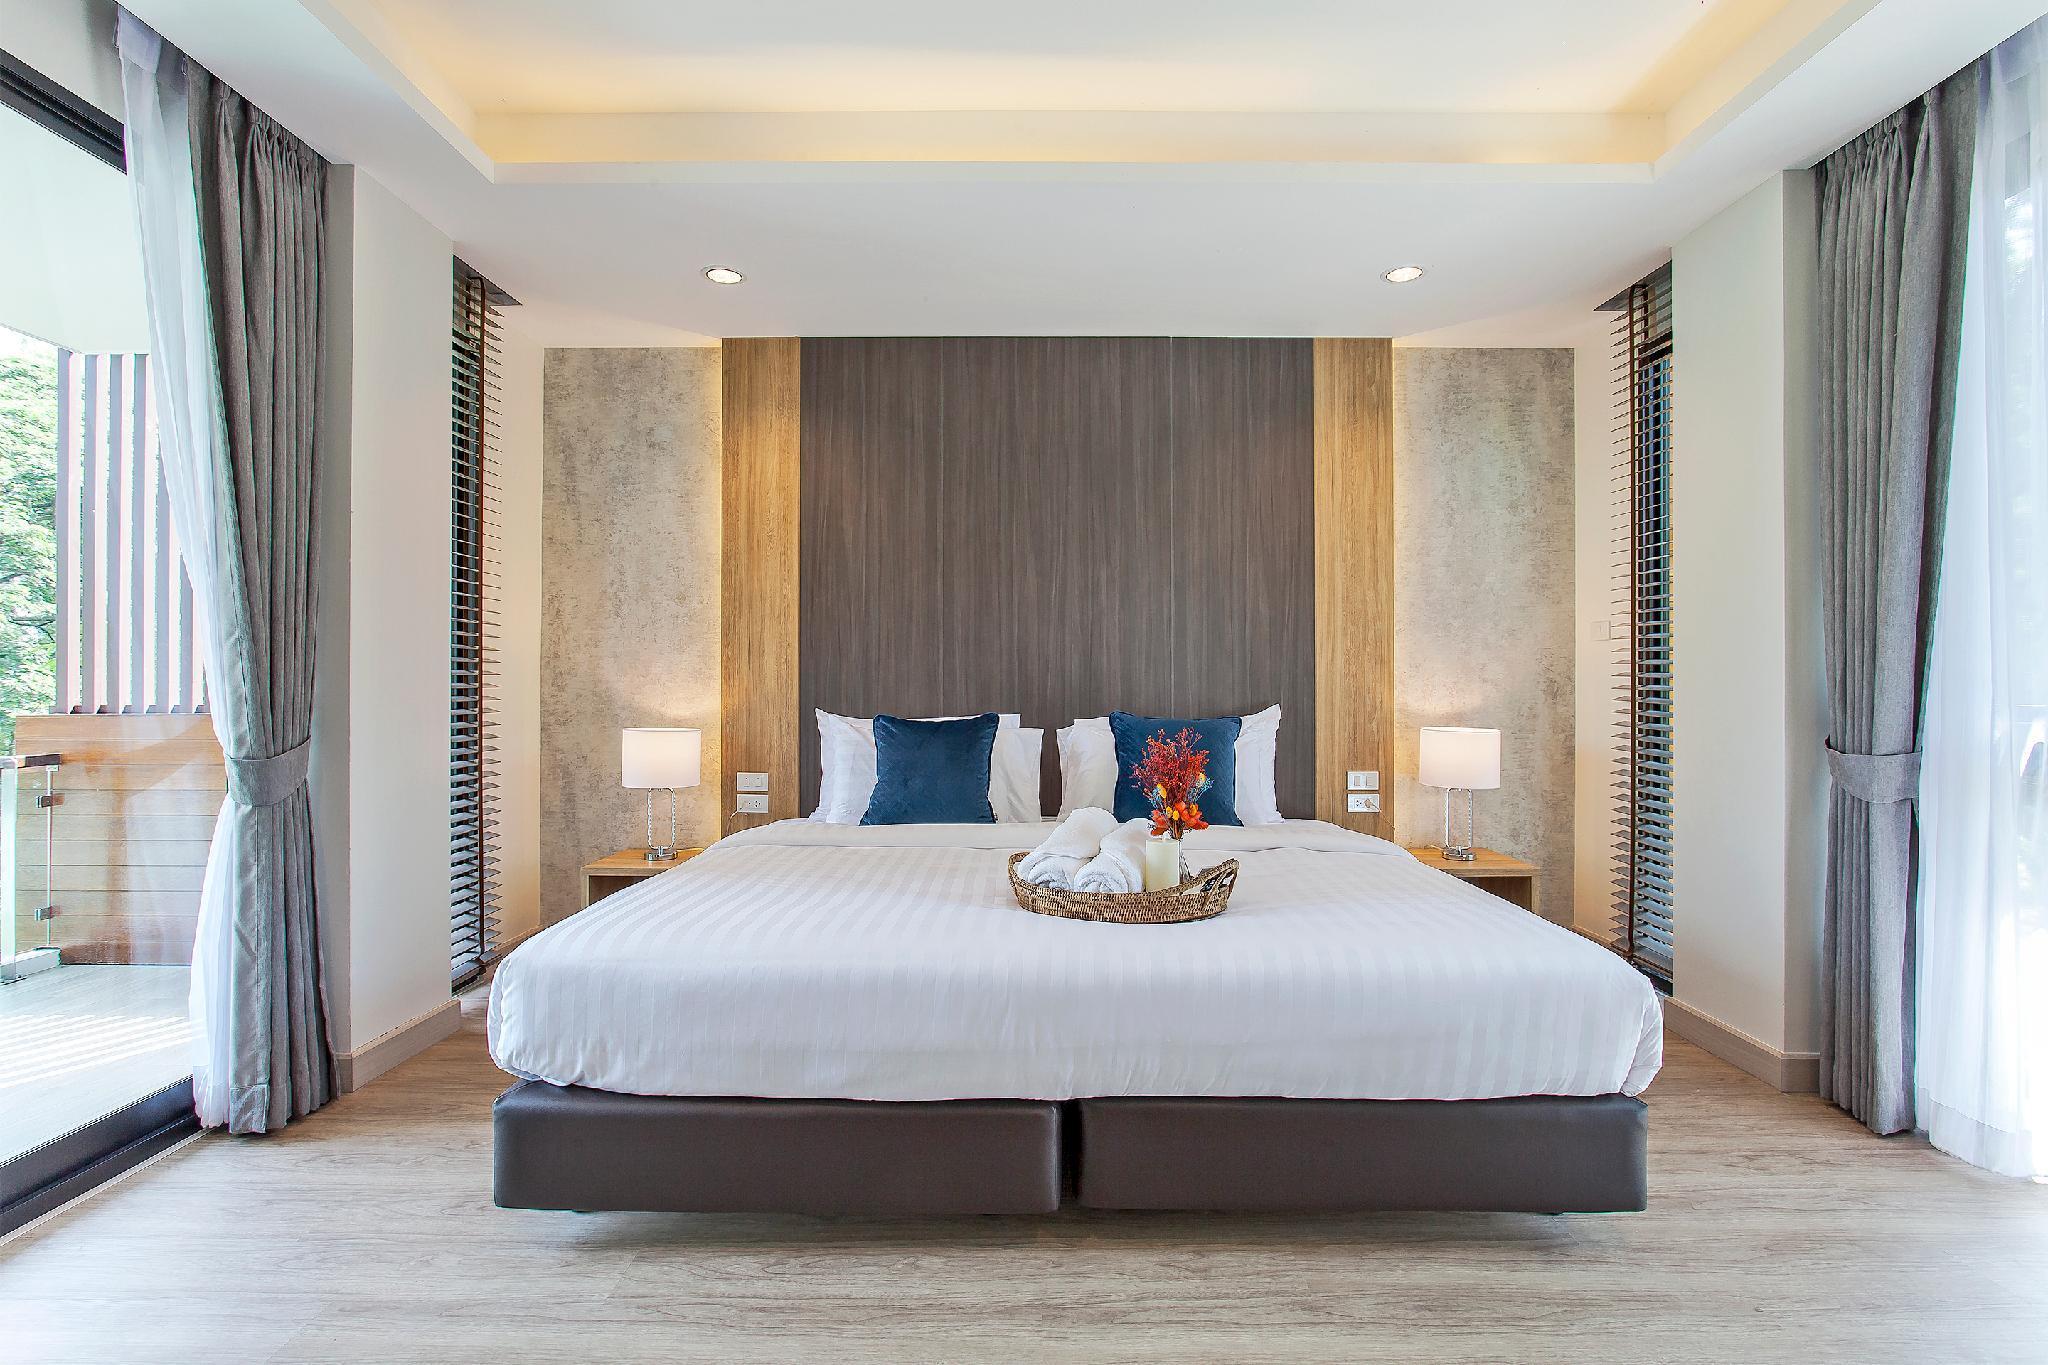 Greentops Luxury Homestay 5BR Sleeps 10 Near City